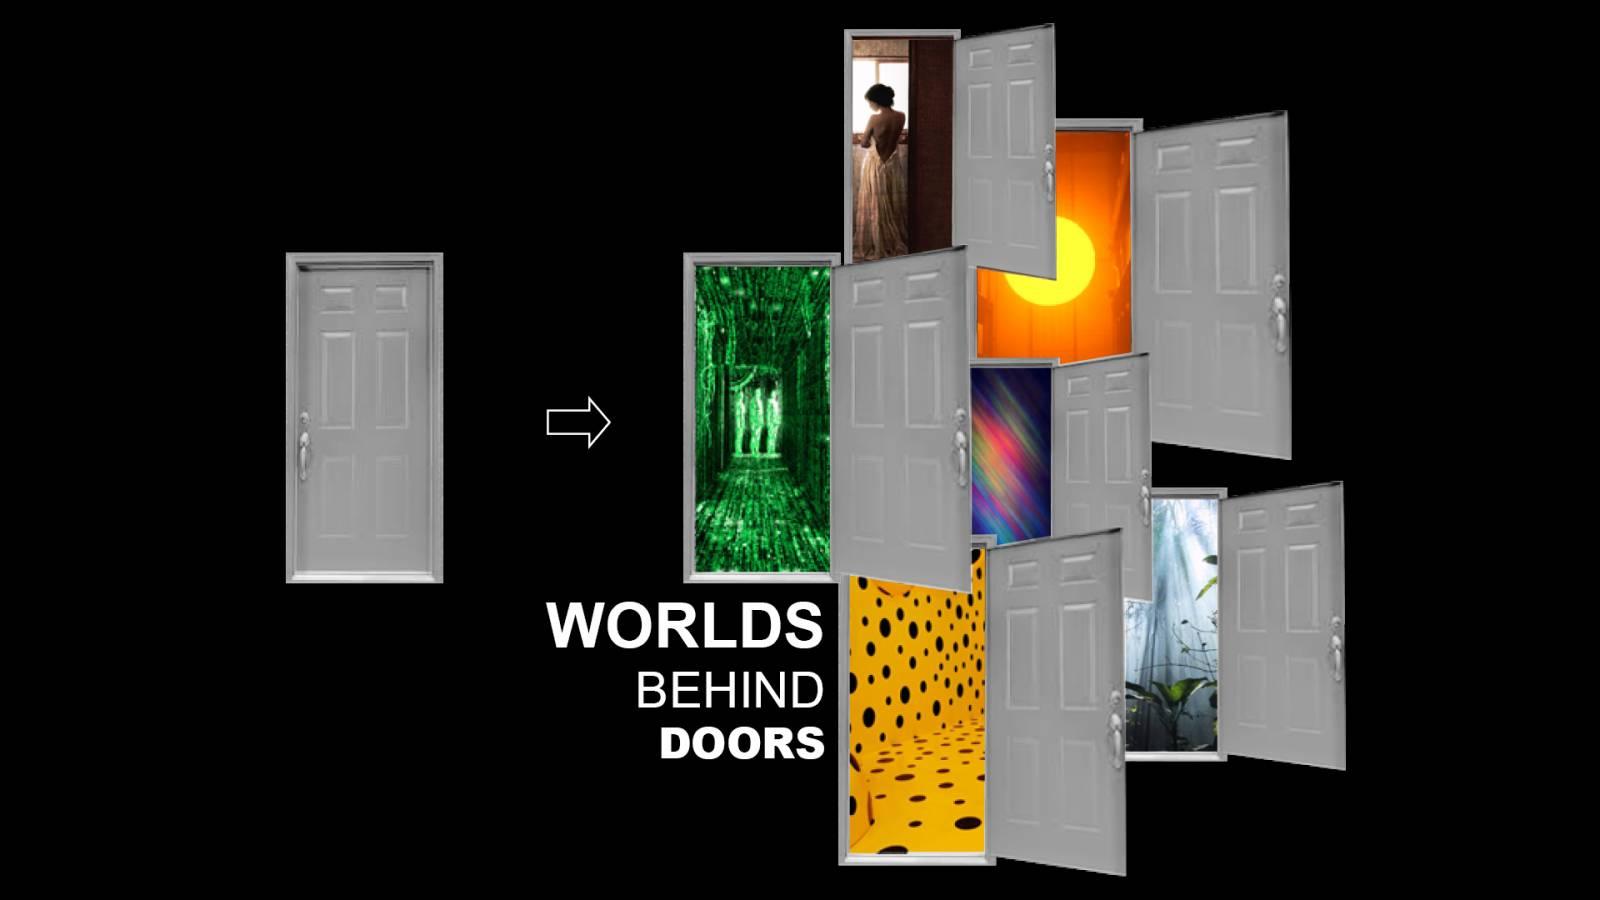 MAIN ROOM DETAIL - Zeppelin Films - SPOL Architects